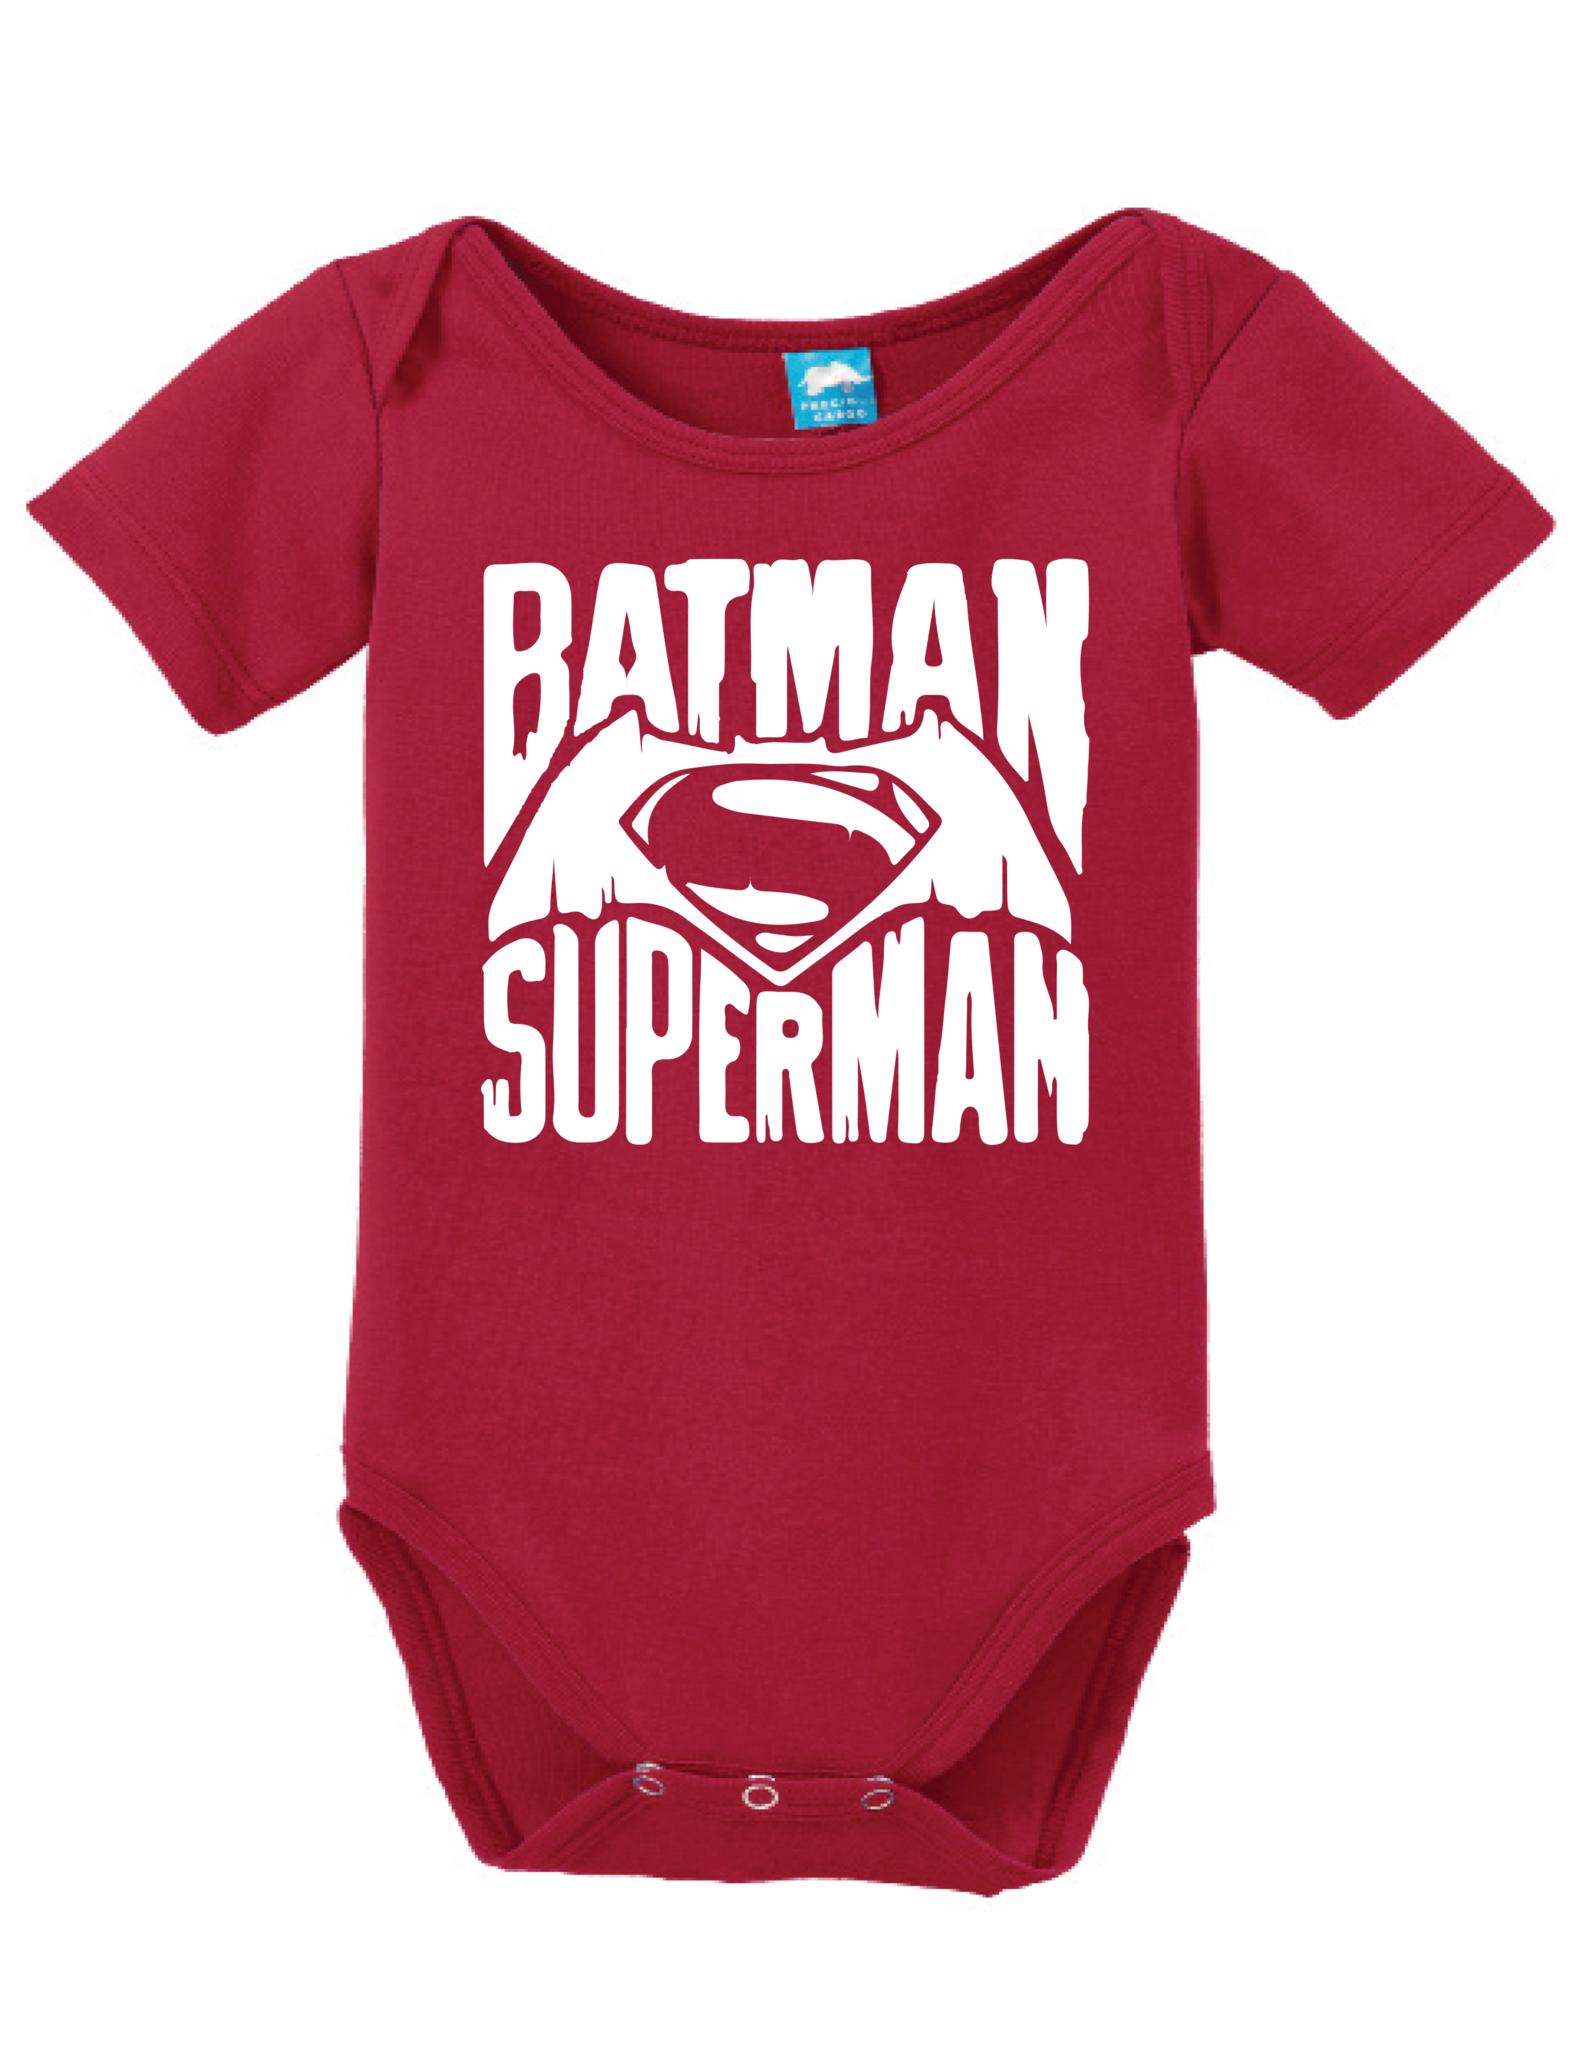 Distressed Batman Superman Onesie Funny Bodysuit Baby Romper